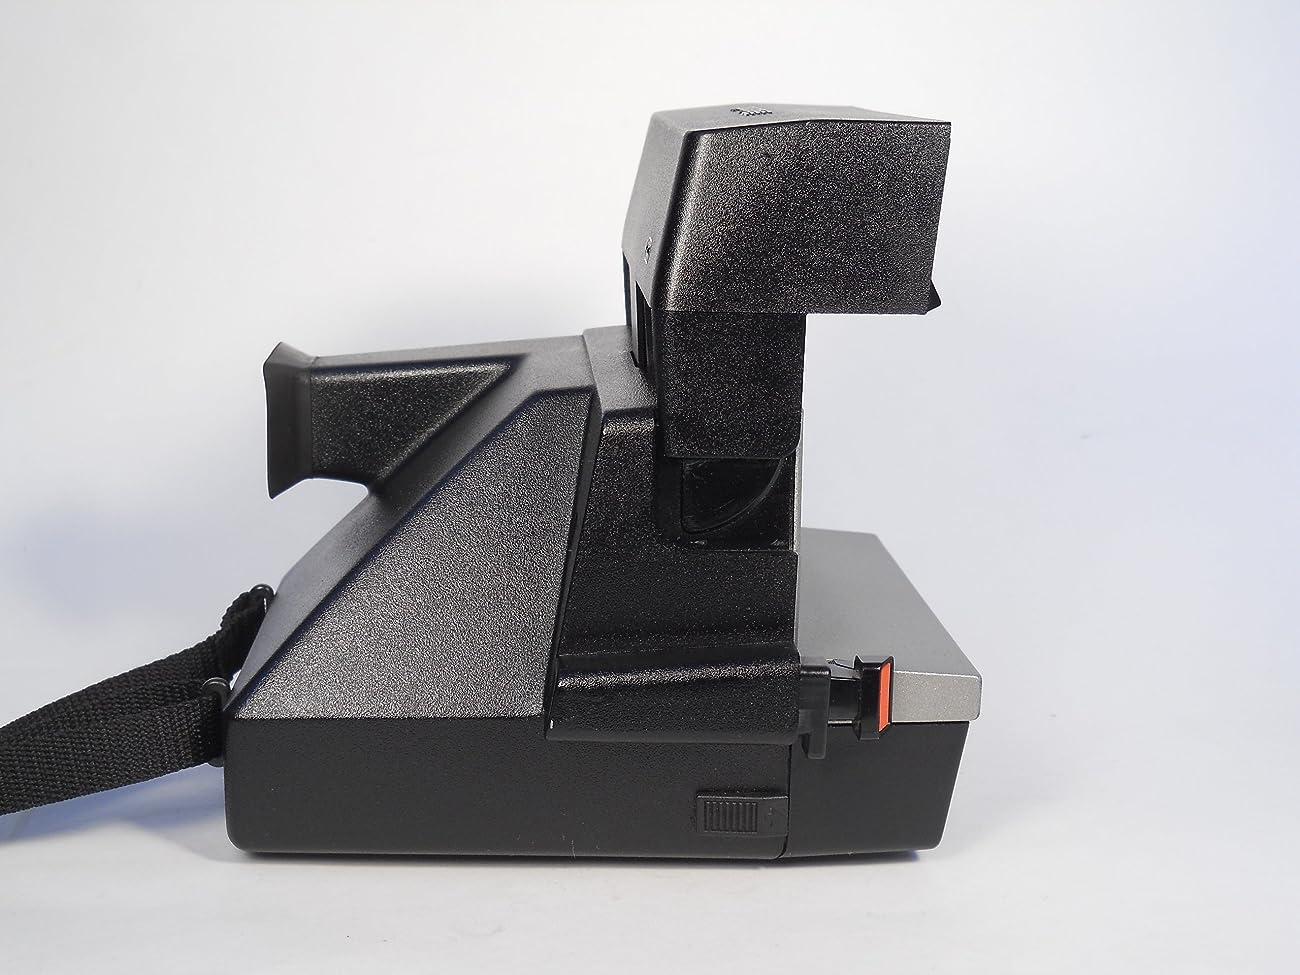 Polaroid Spirit 600 Vintage Instant Camera w/ Silver/Gray Front 4